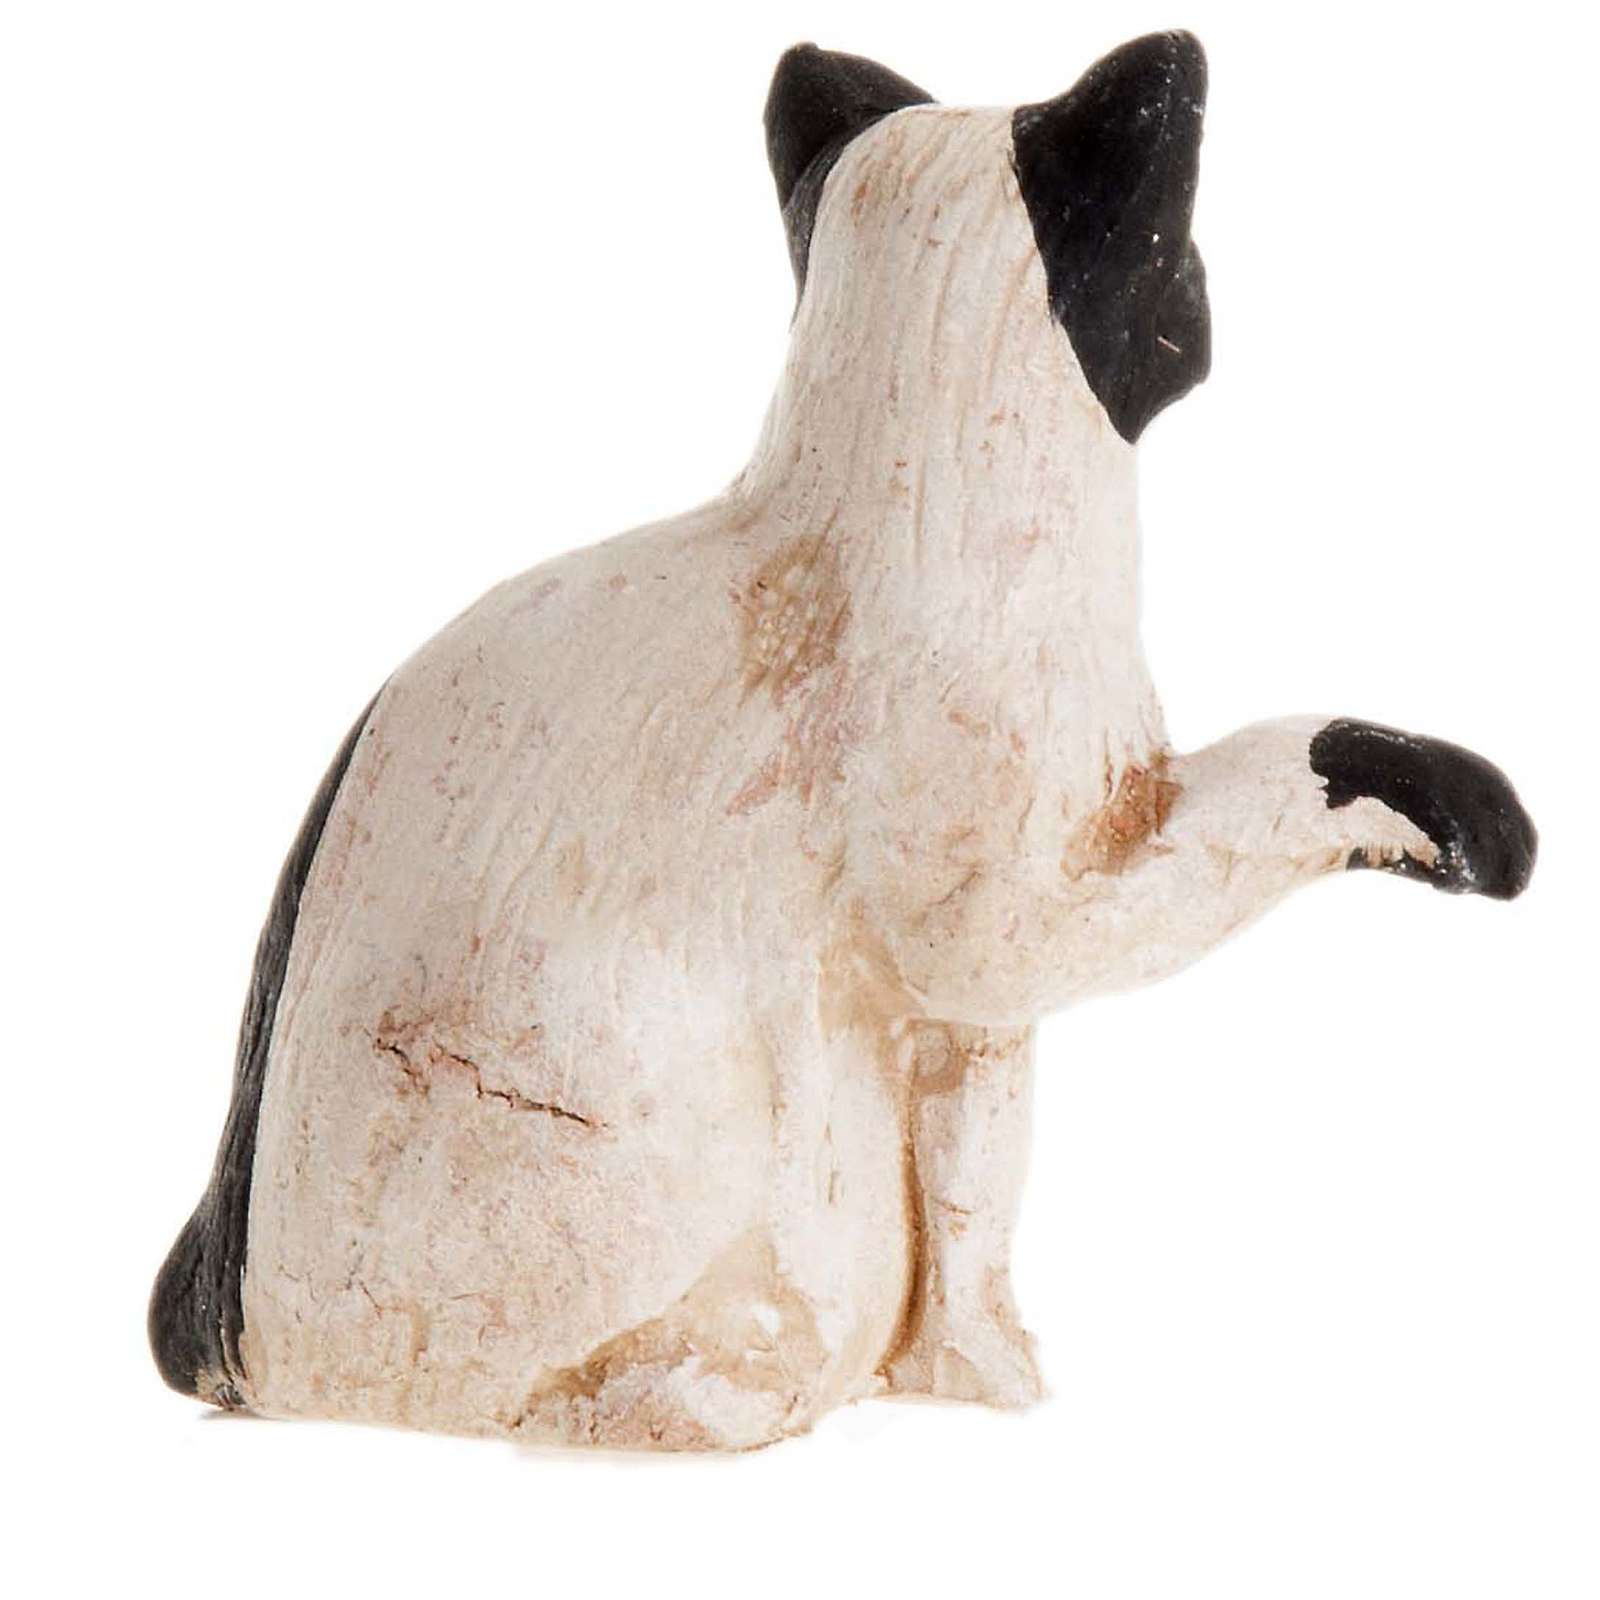 Chat blanc Napolitaine 14 cm terre cuite 4